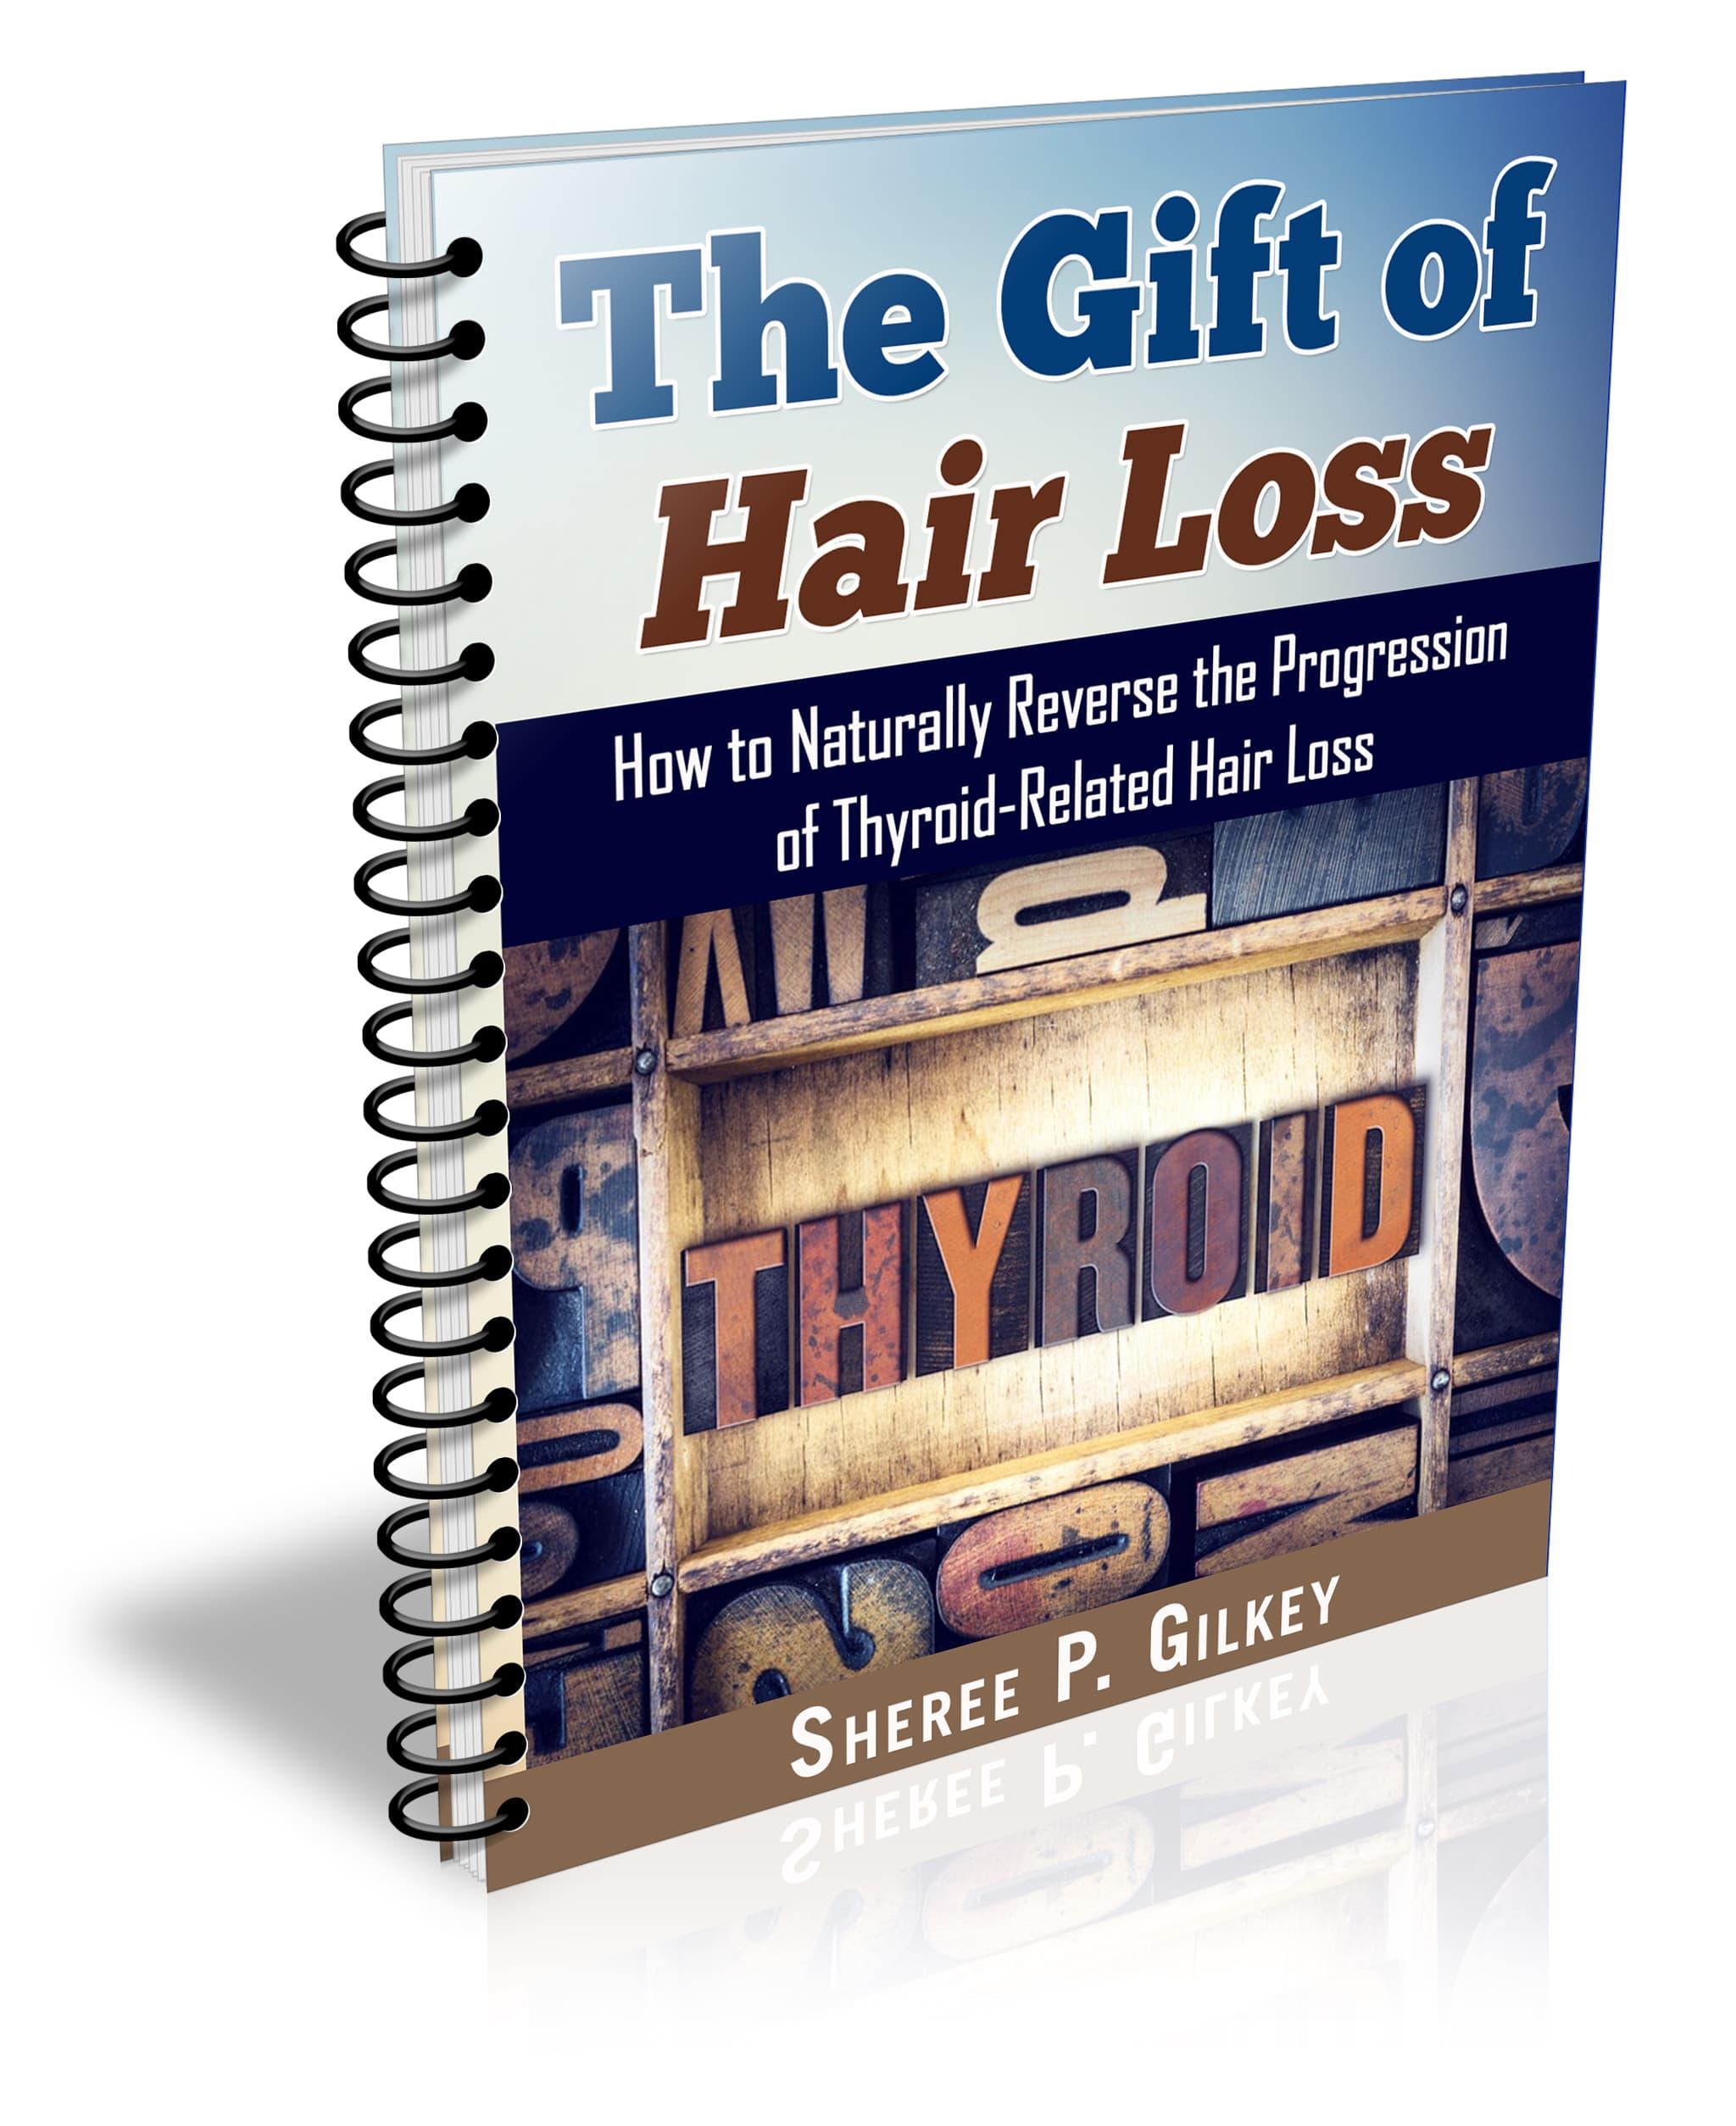 The Gift of Hair Loss